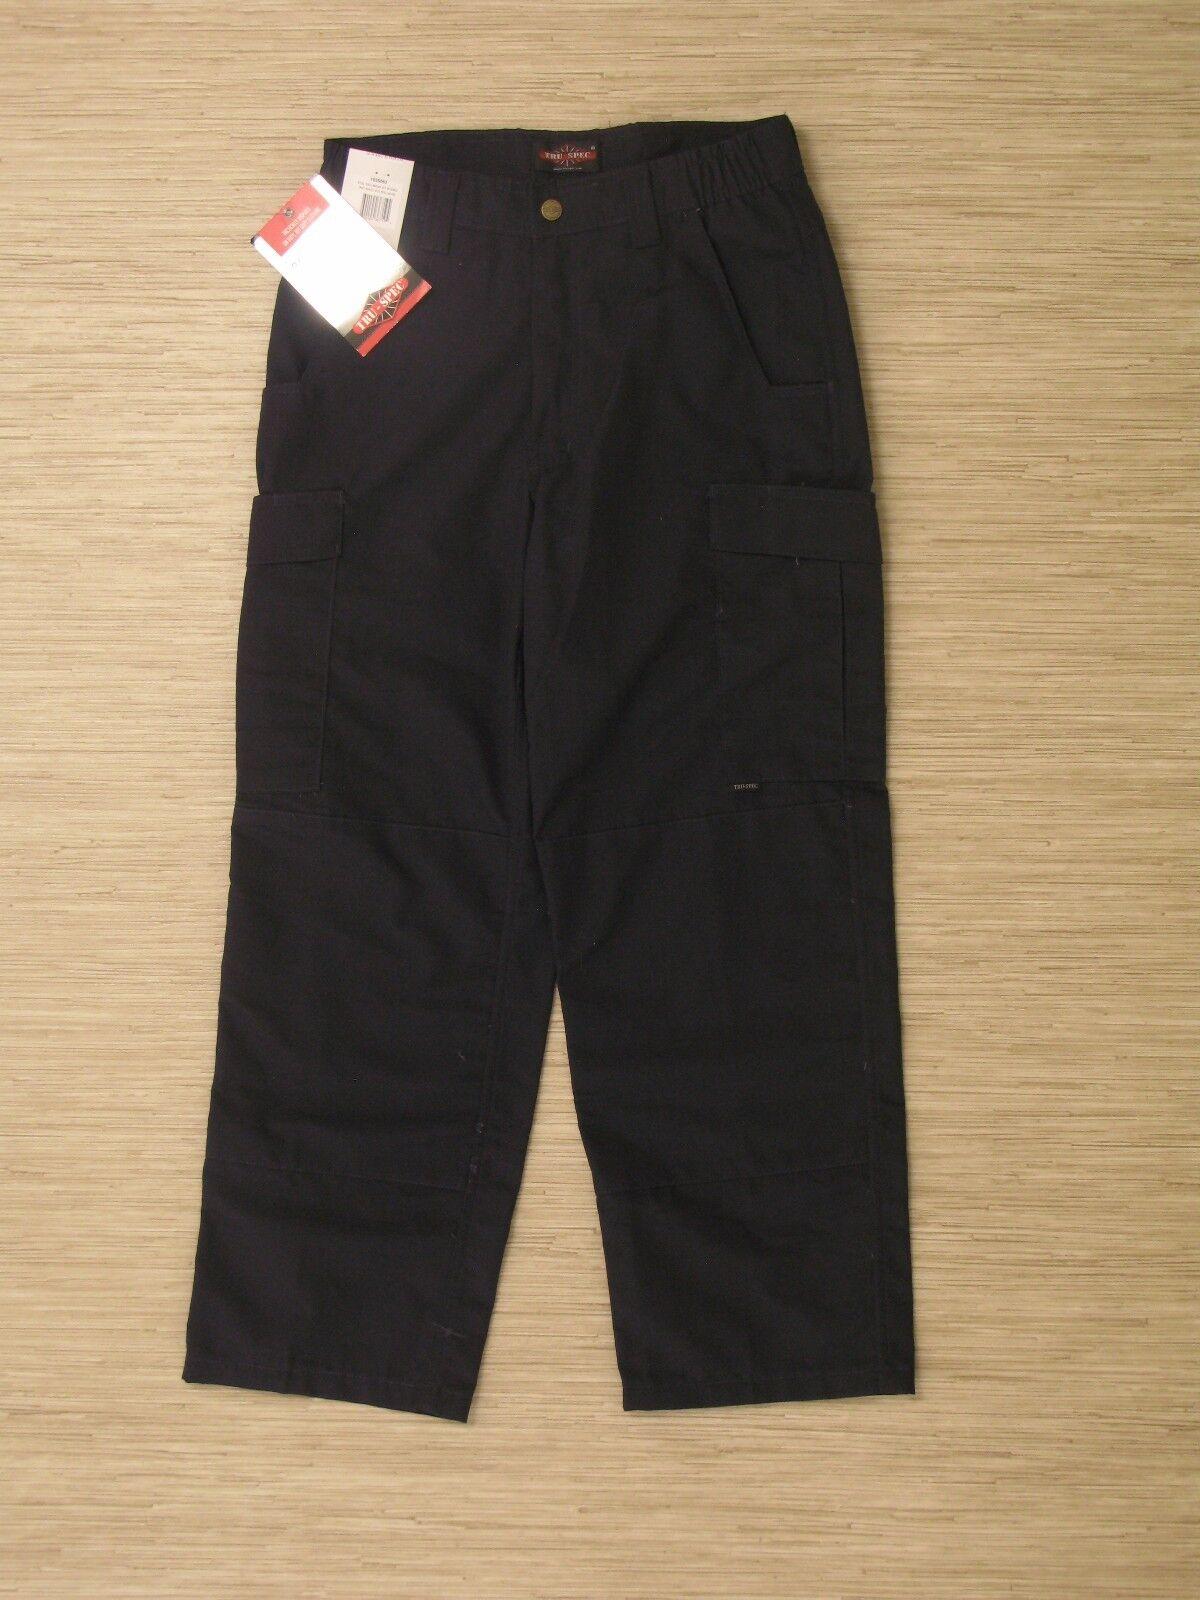 Tru-Spec 24-7 Series Navy bluee Cotton Blend Cargo Pants Mens Size 30x36 Rip Stop